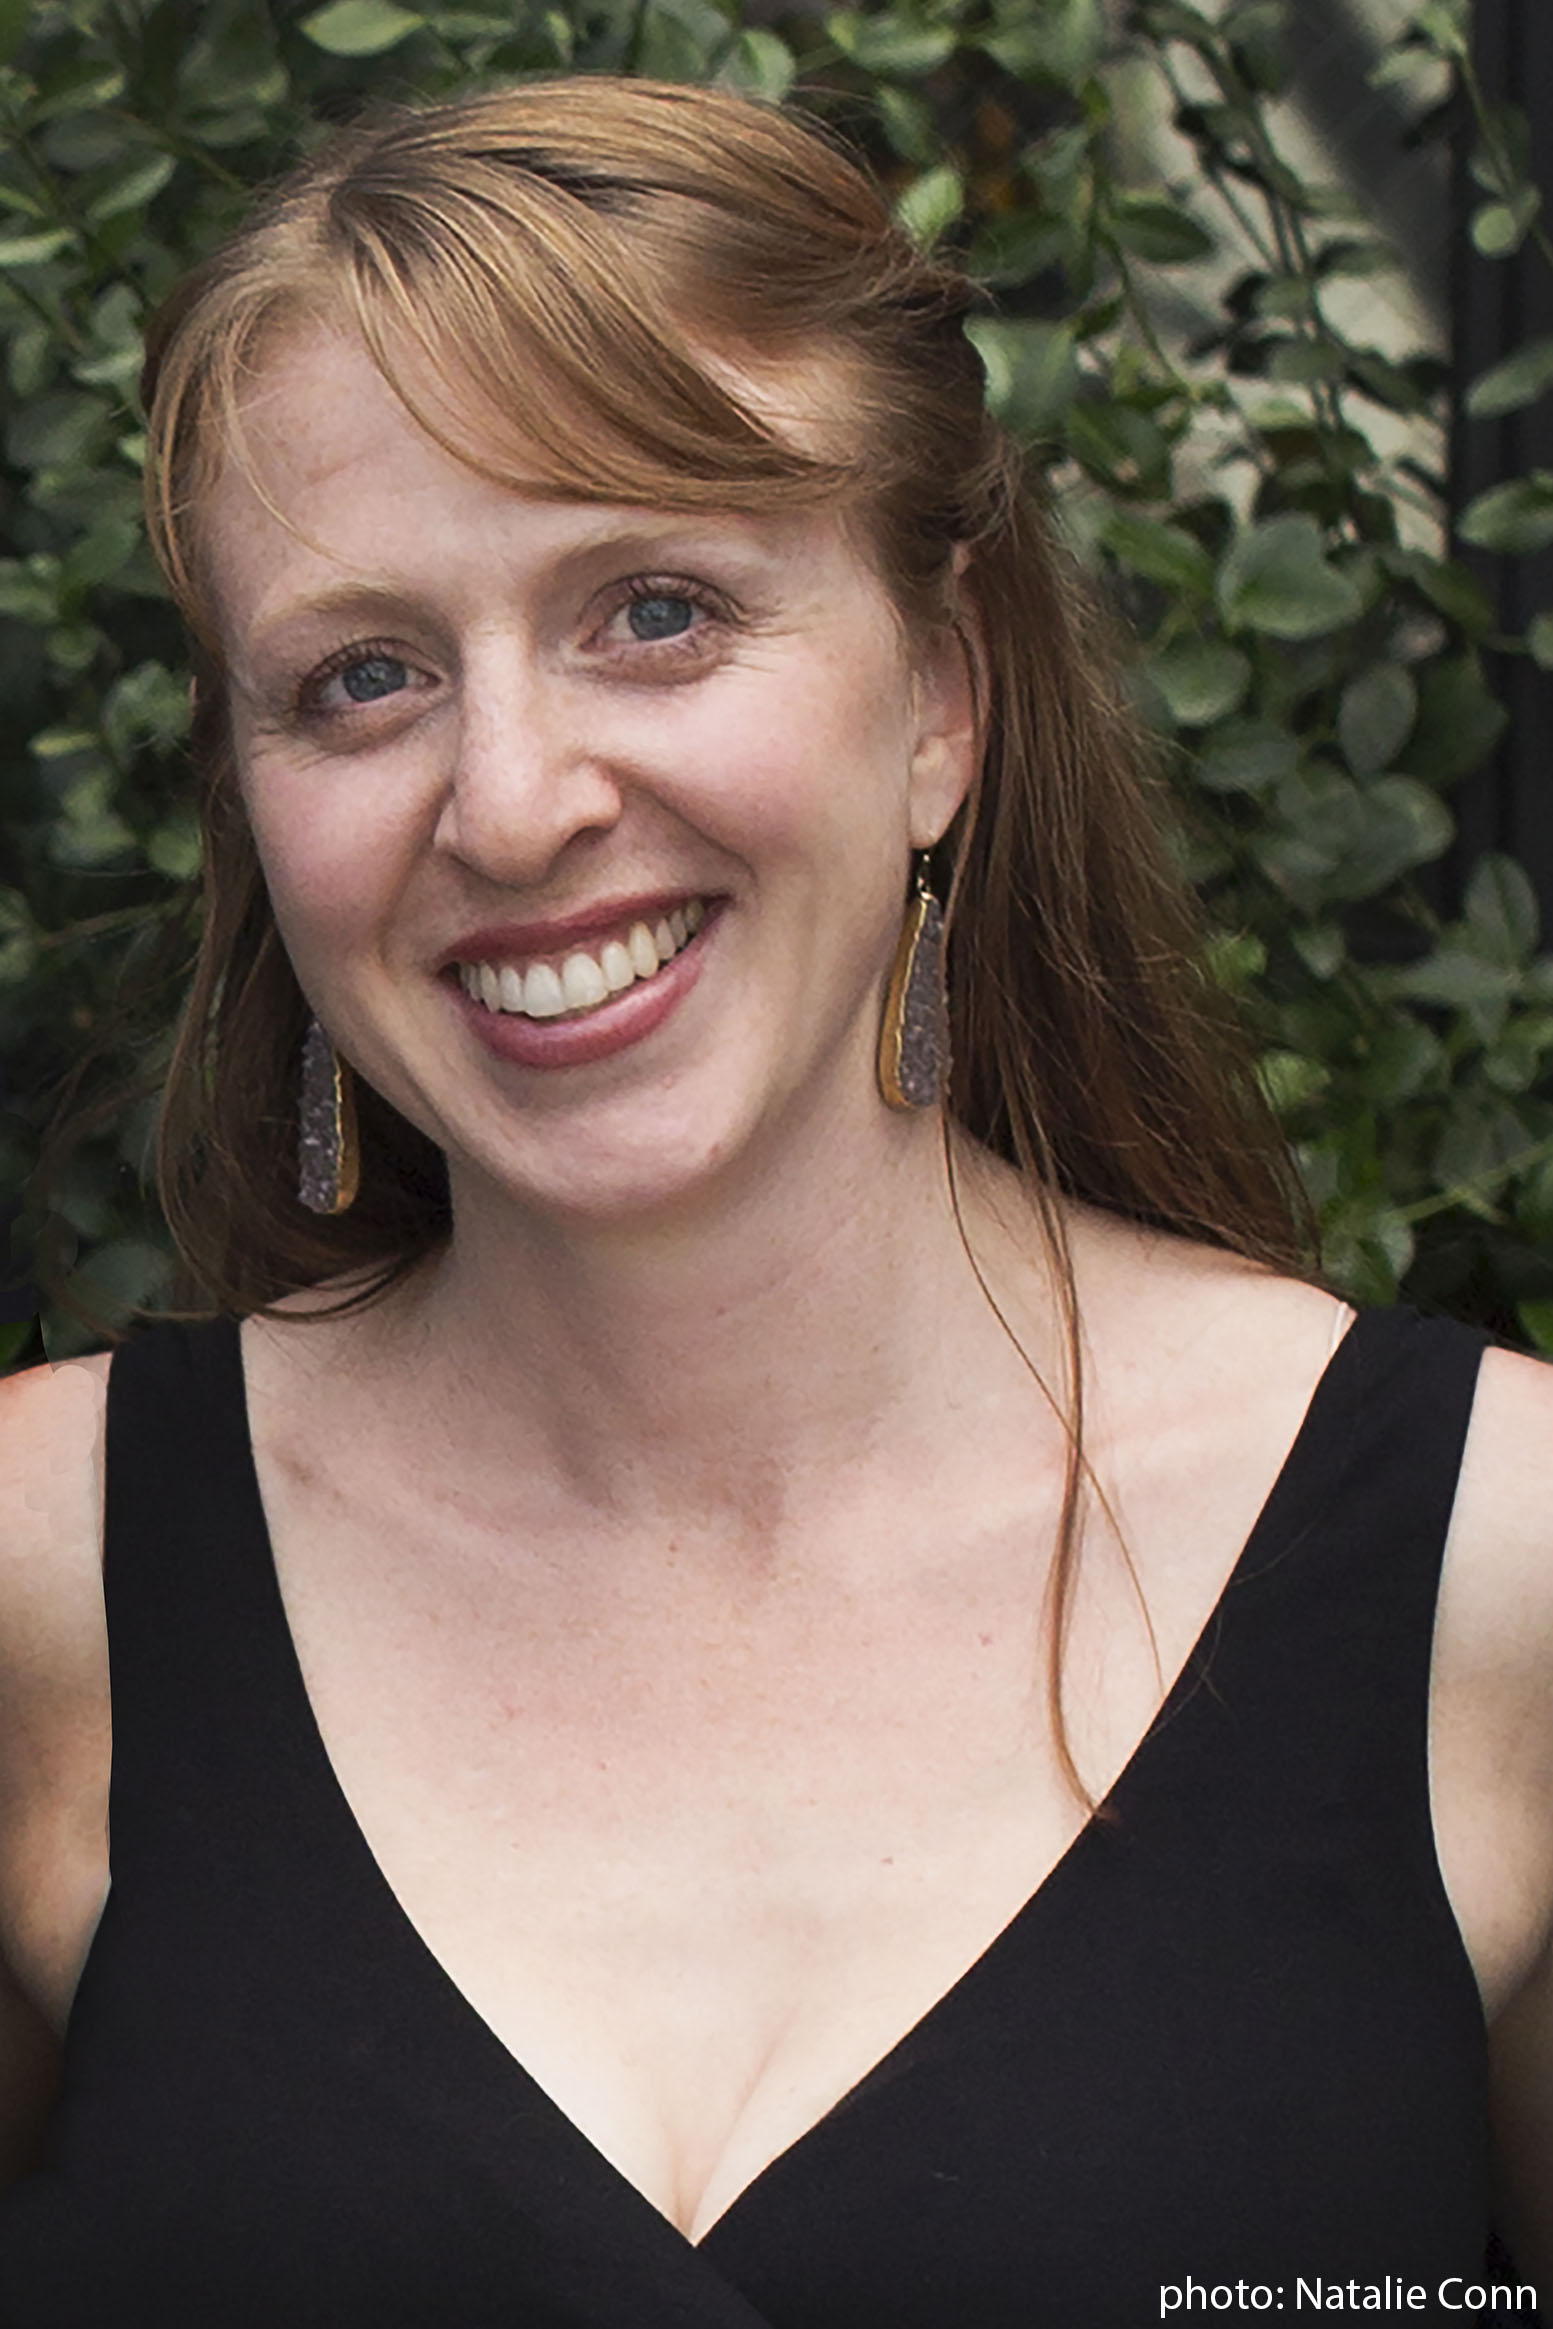 Sara Franklin Author Photo __ Credit Natalie Conn - Lauren Salkeld